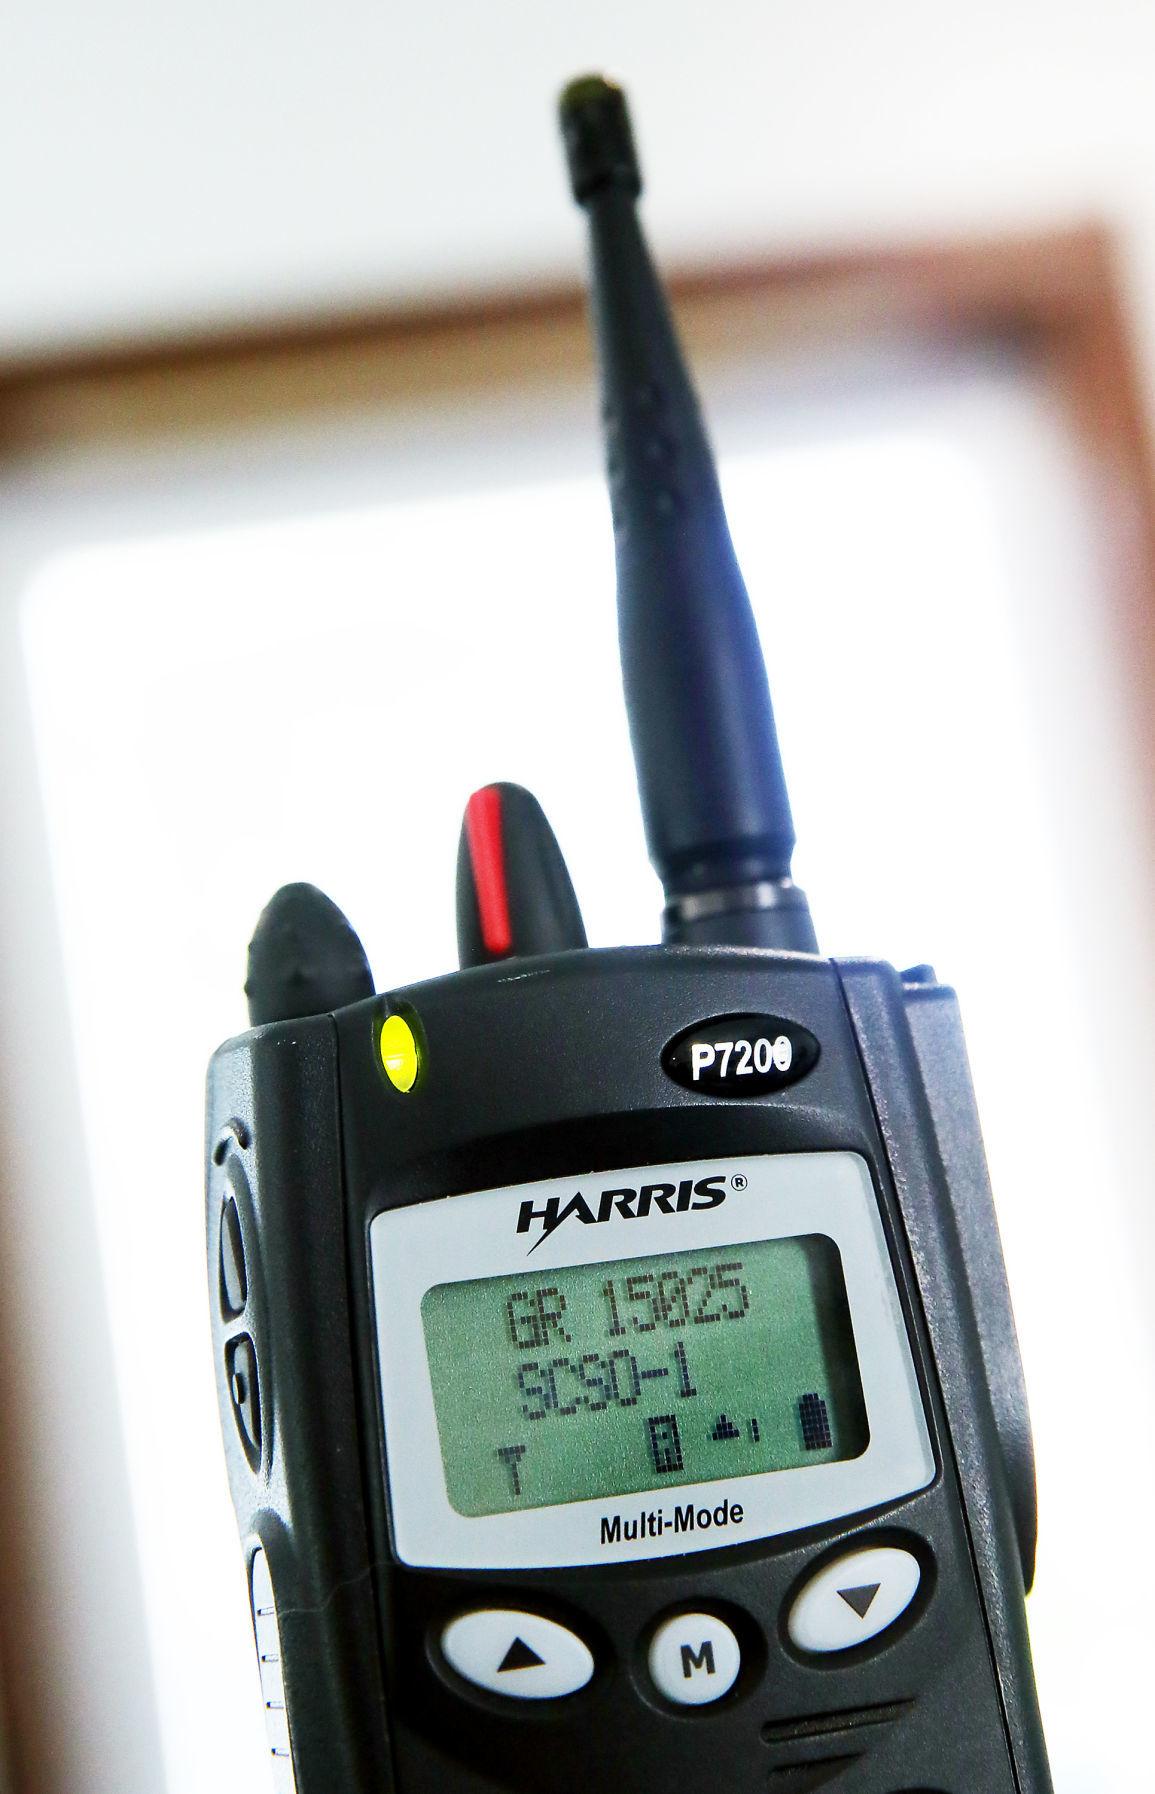 050519-qct-radioproject-ks-002